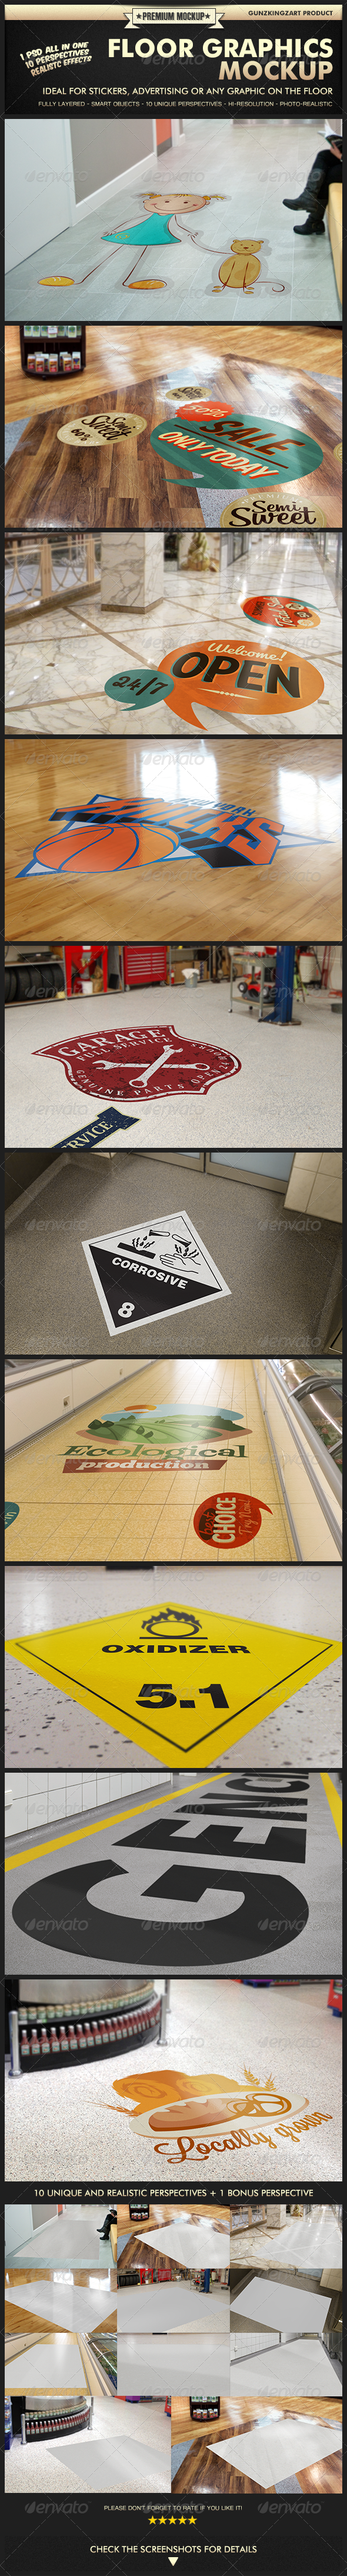 GraphicRiver Floor Graphics Mockup Premium Kit 5243019